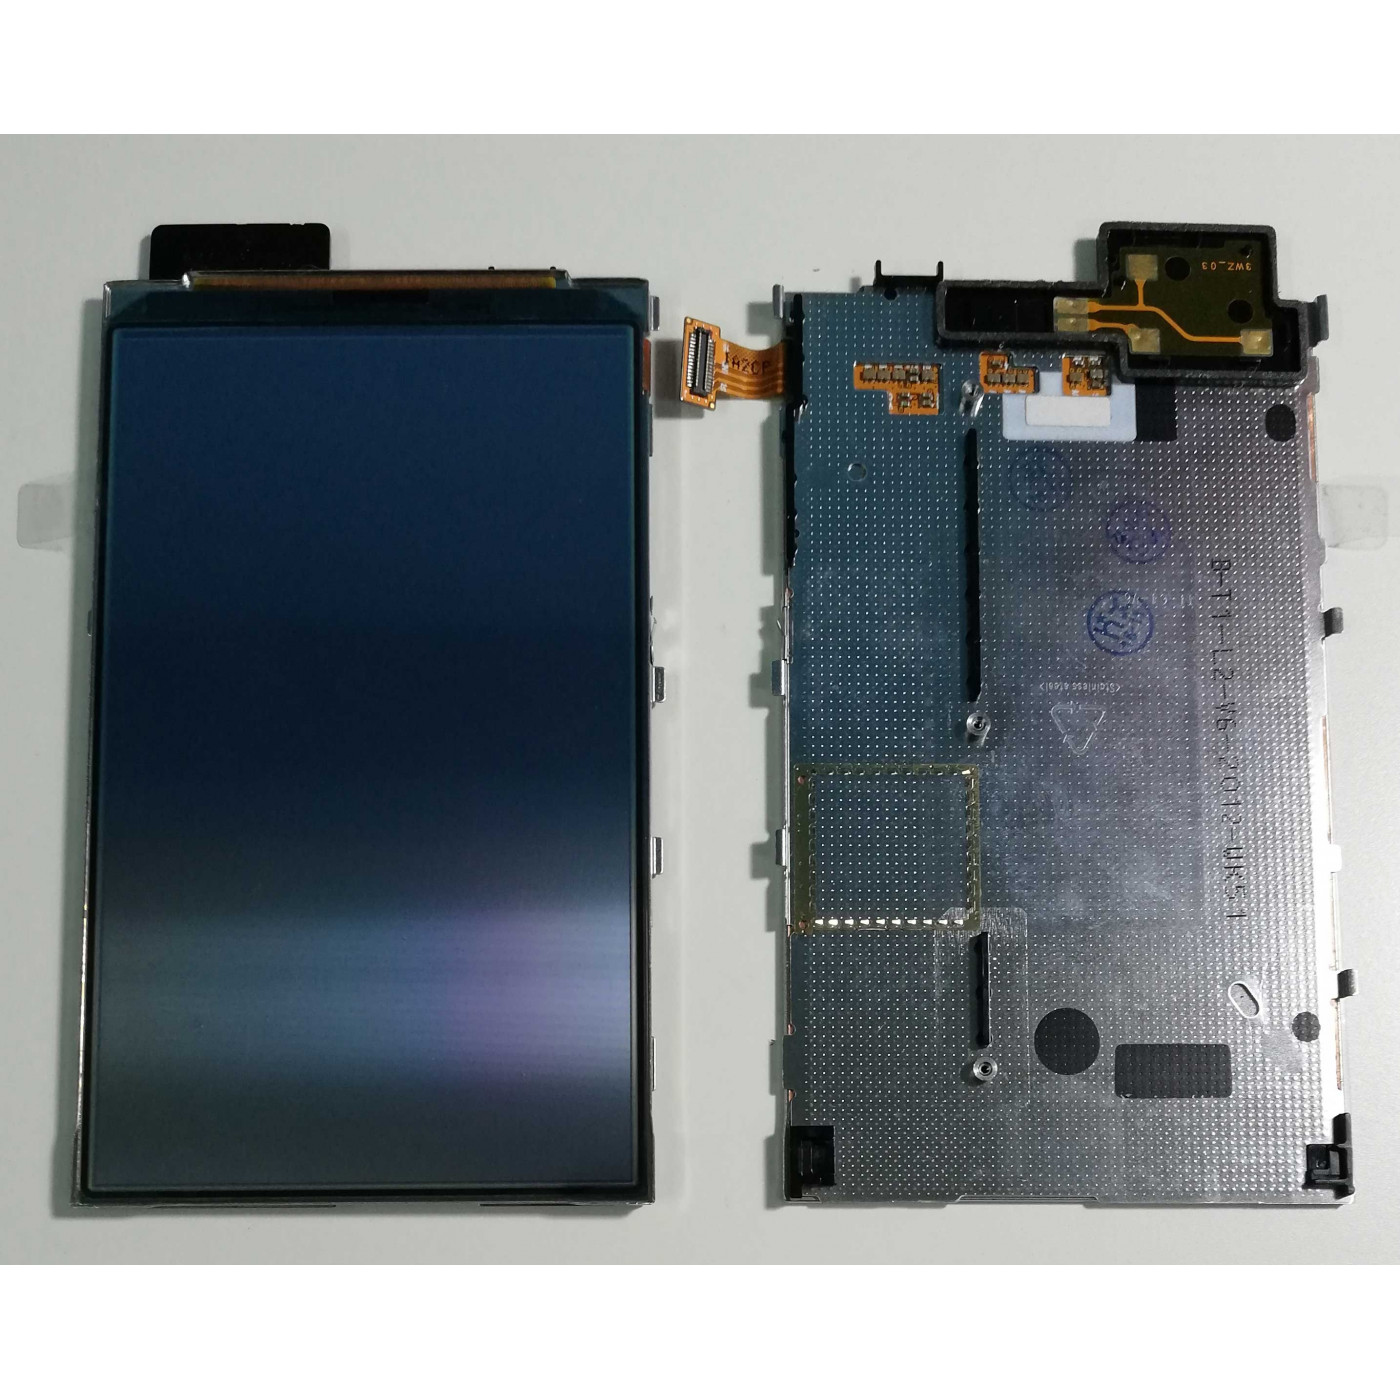 LCD DISPLAY Nokia Lumia 820 SCREEN MONITOR